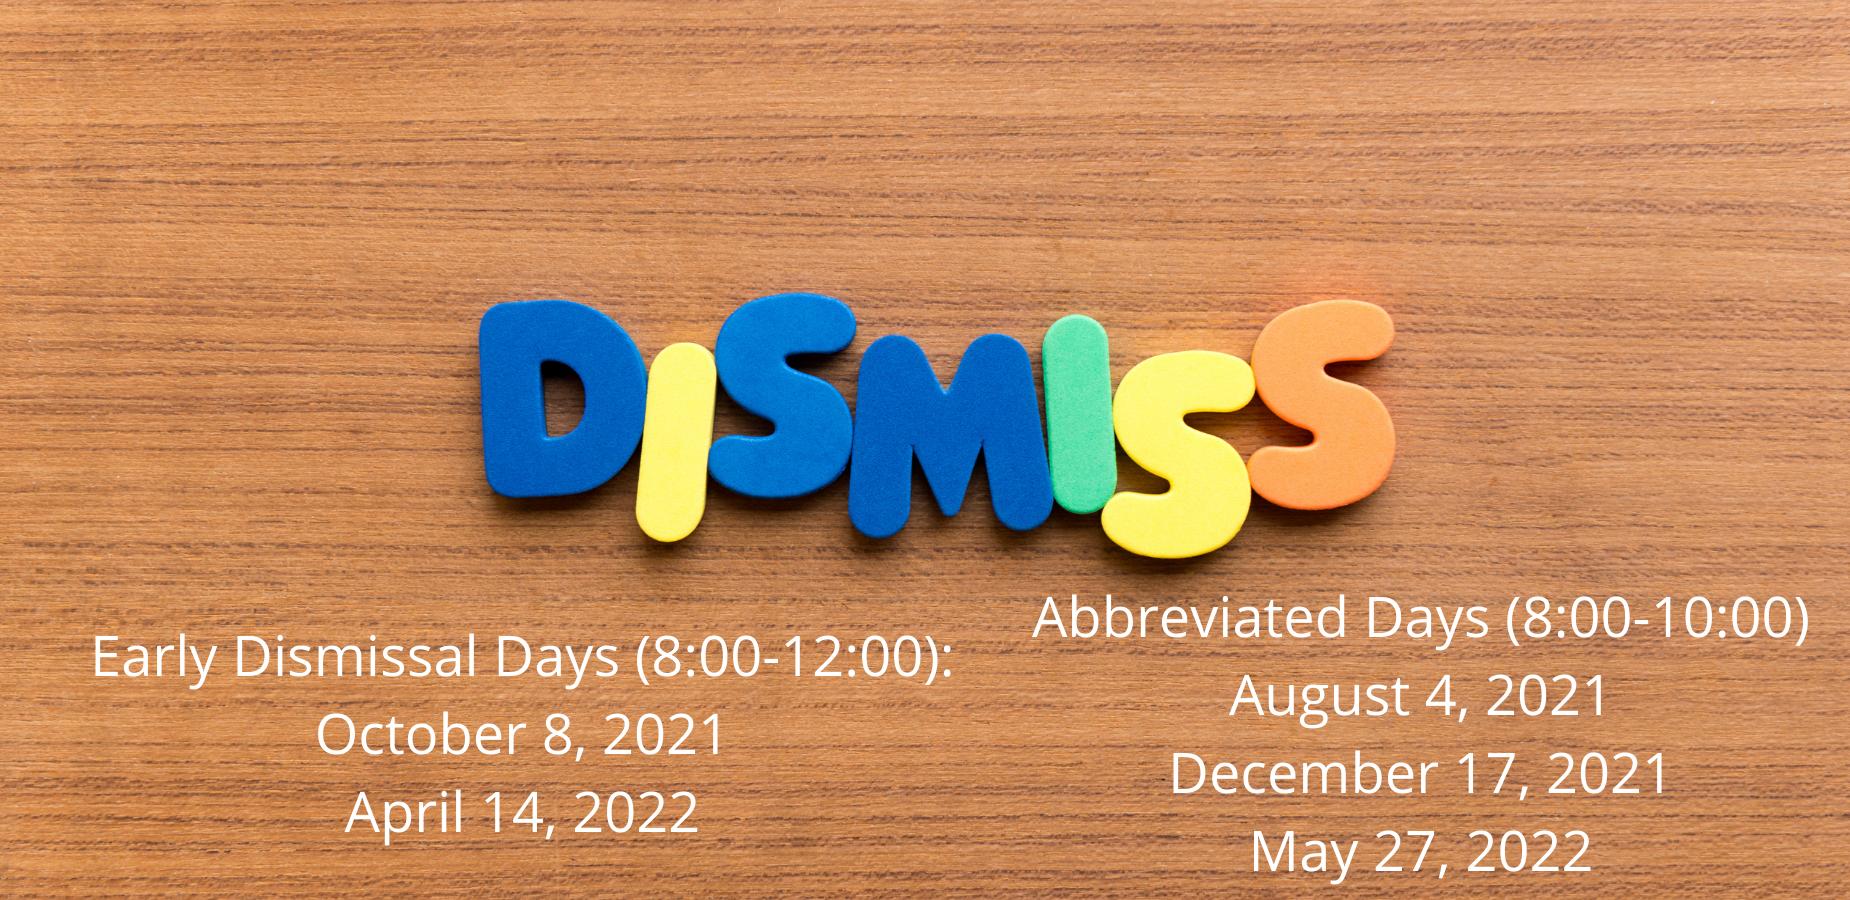 Special Dismissal Days